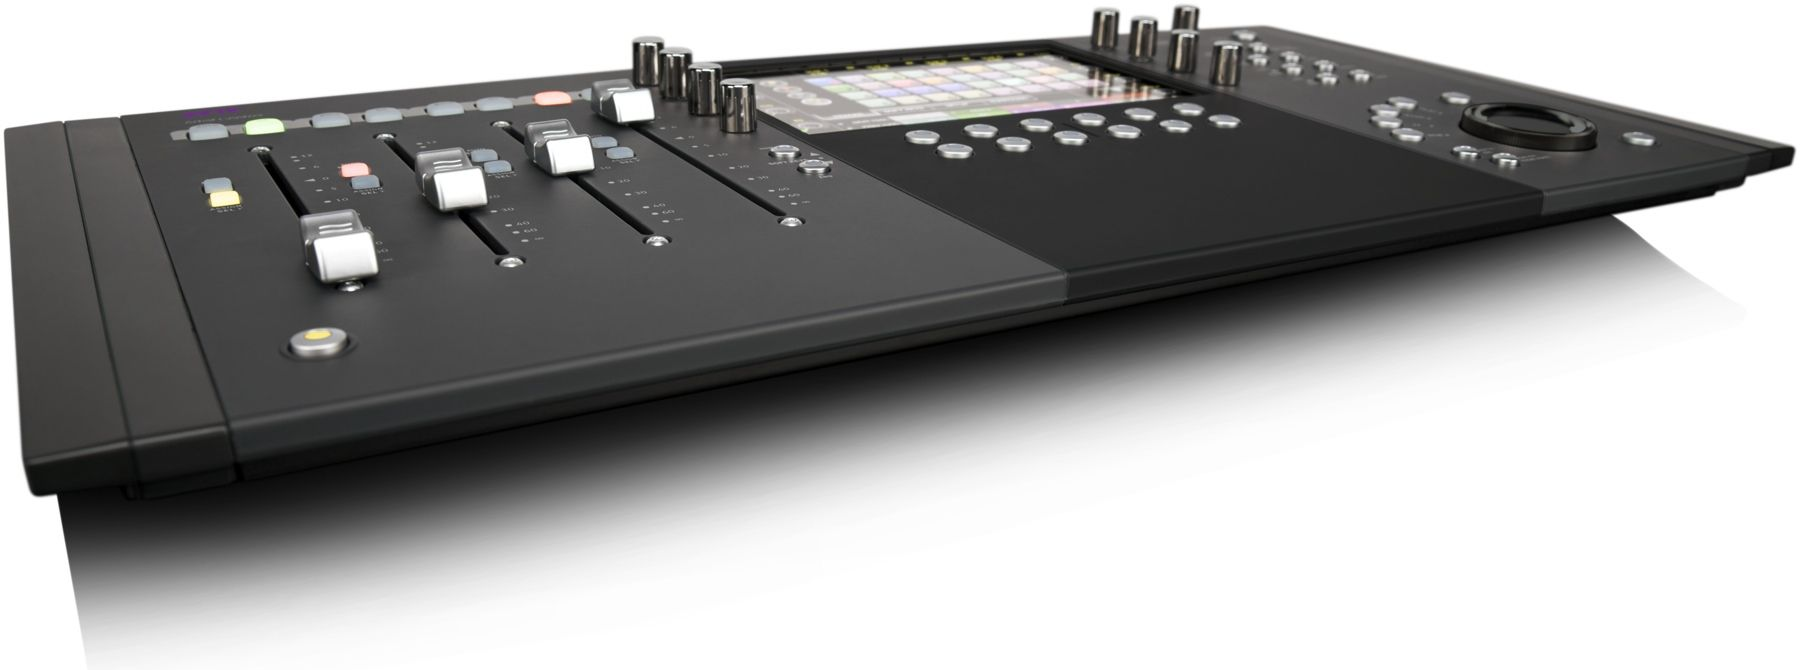 Avid s1 control surface studio equipment surface music